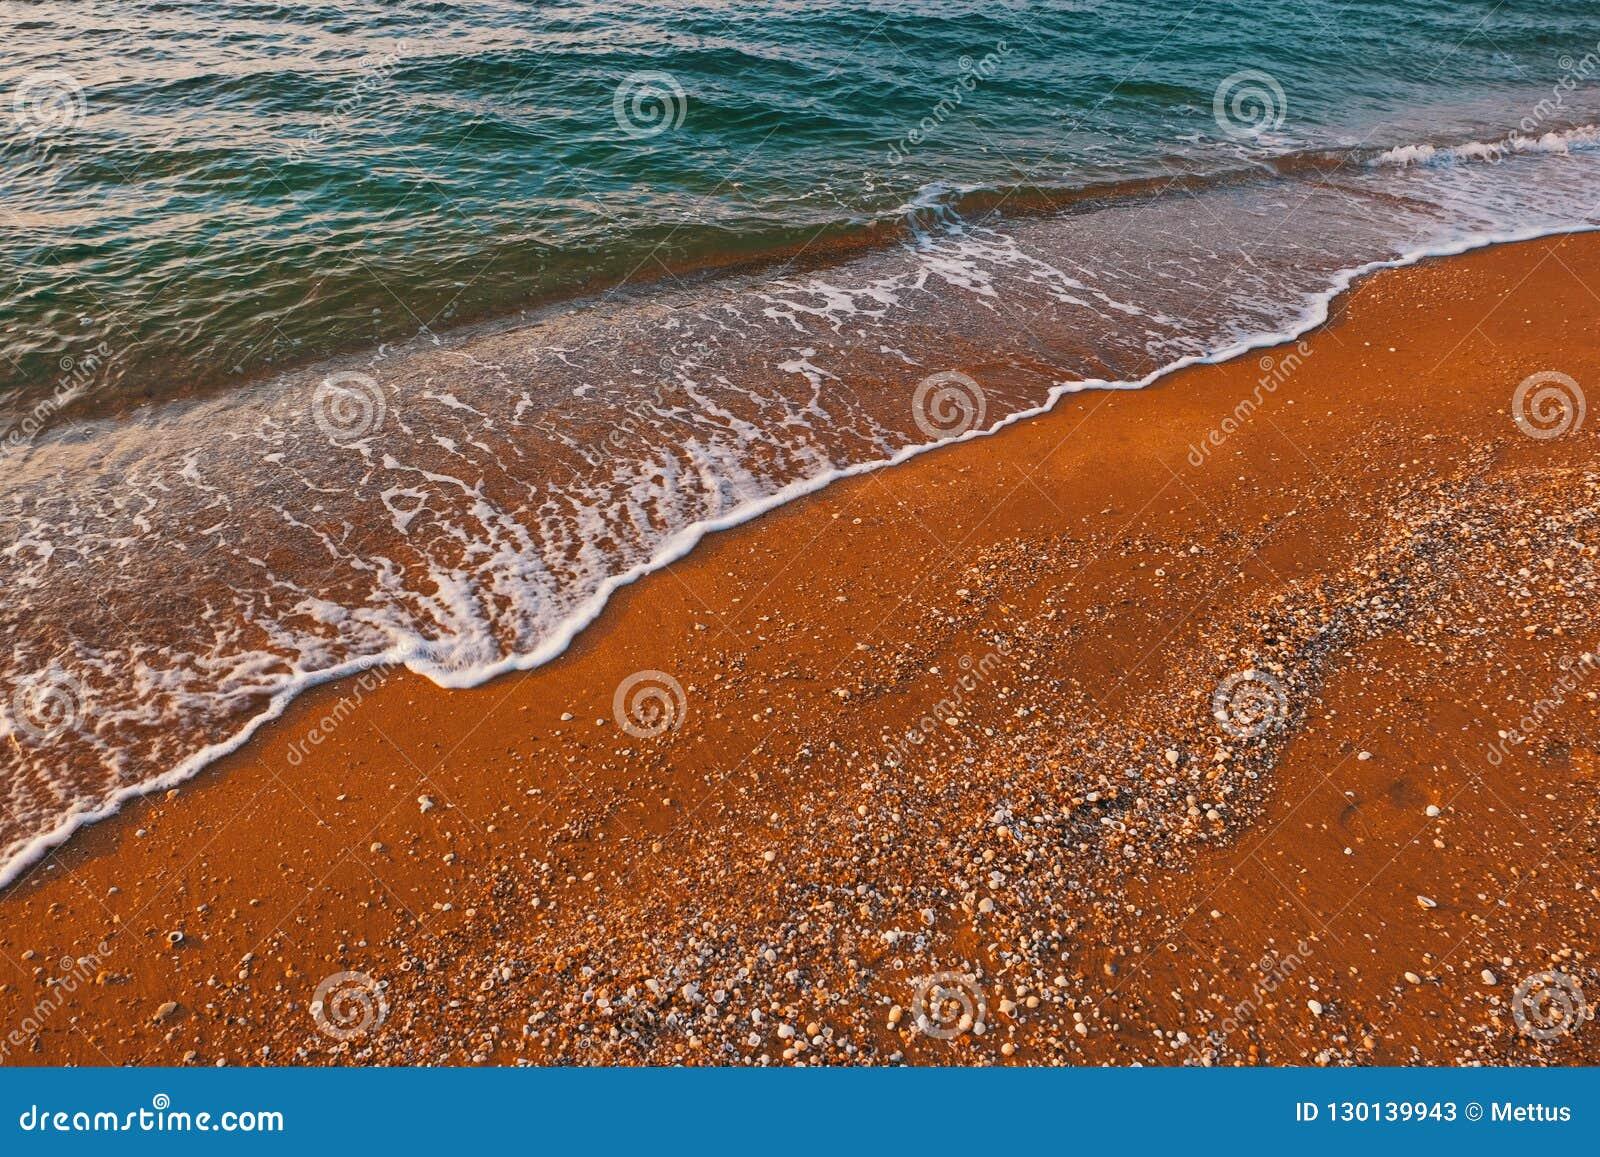 Zandige zeekust met zachte golf